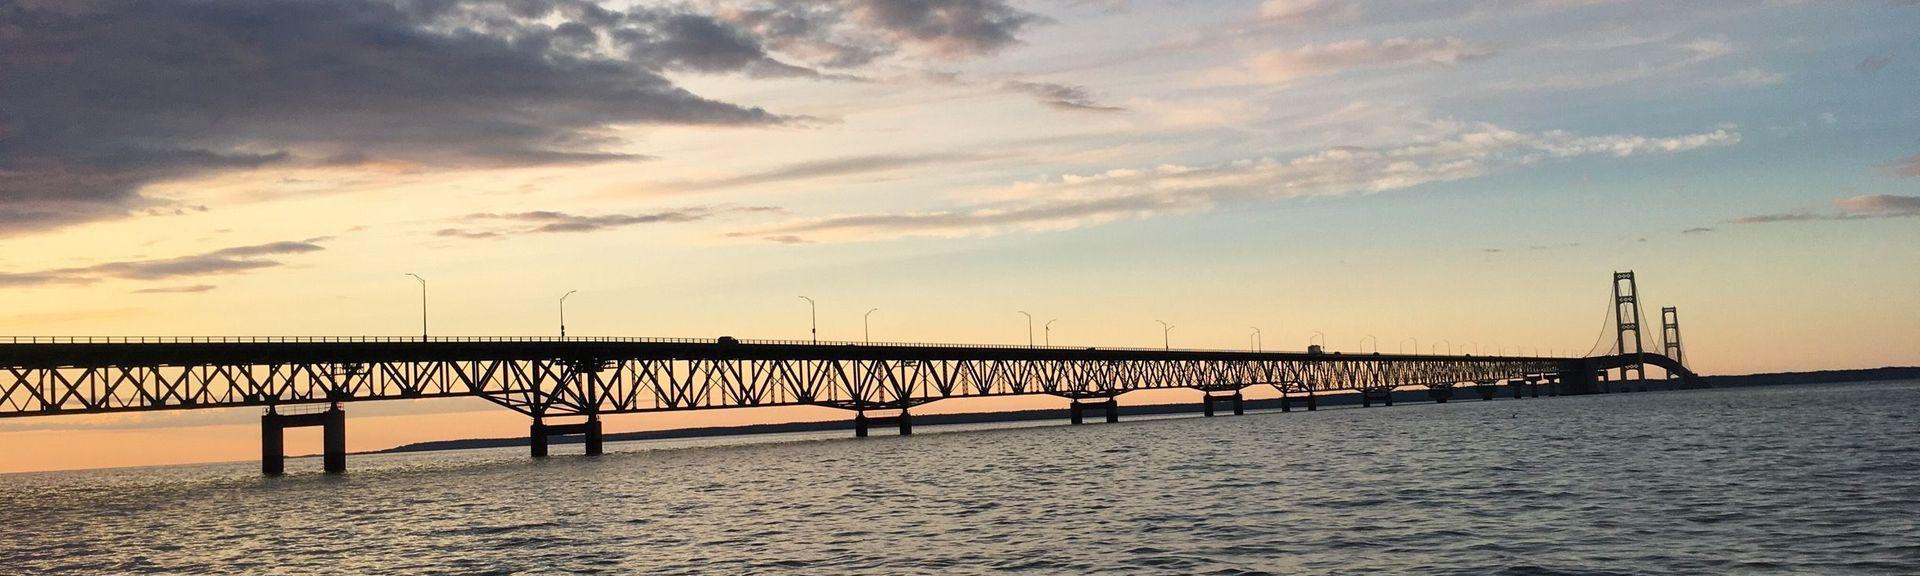 Mackinac Bridge, Mackinaw City, MI, USA